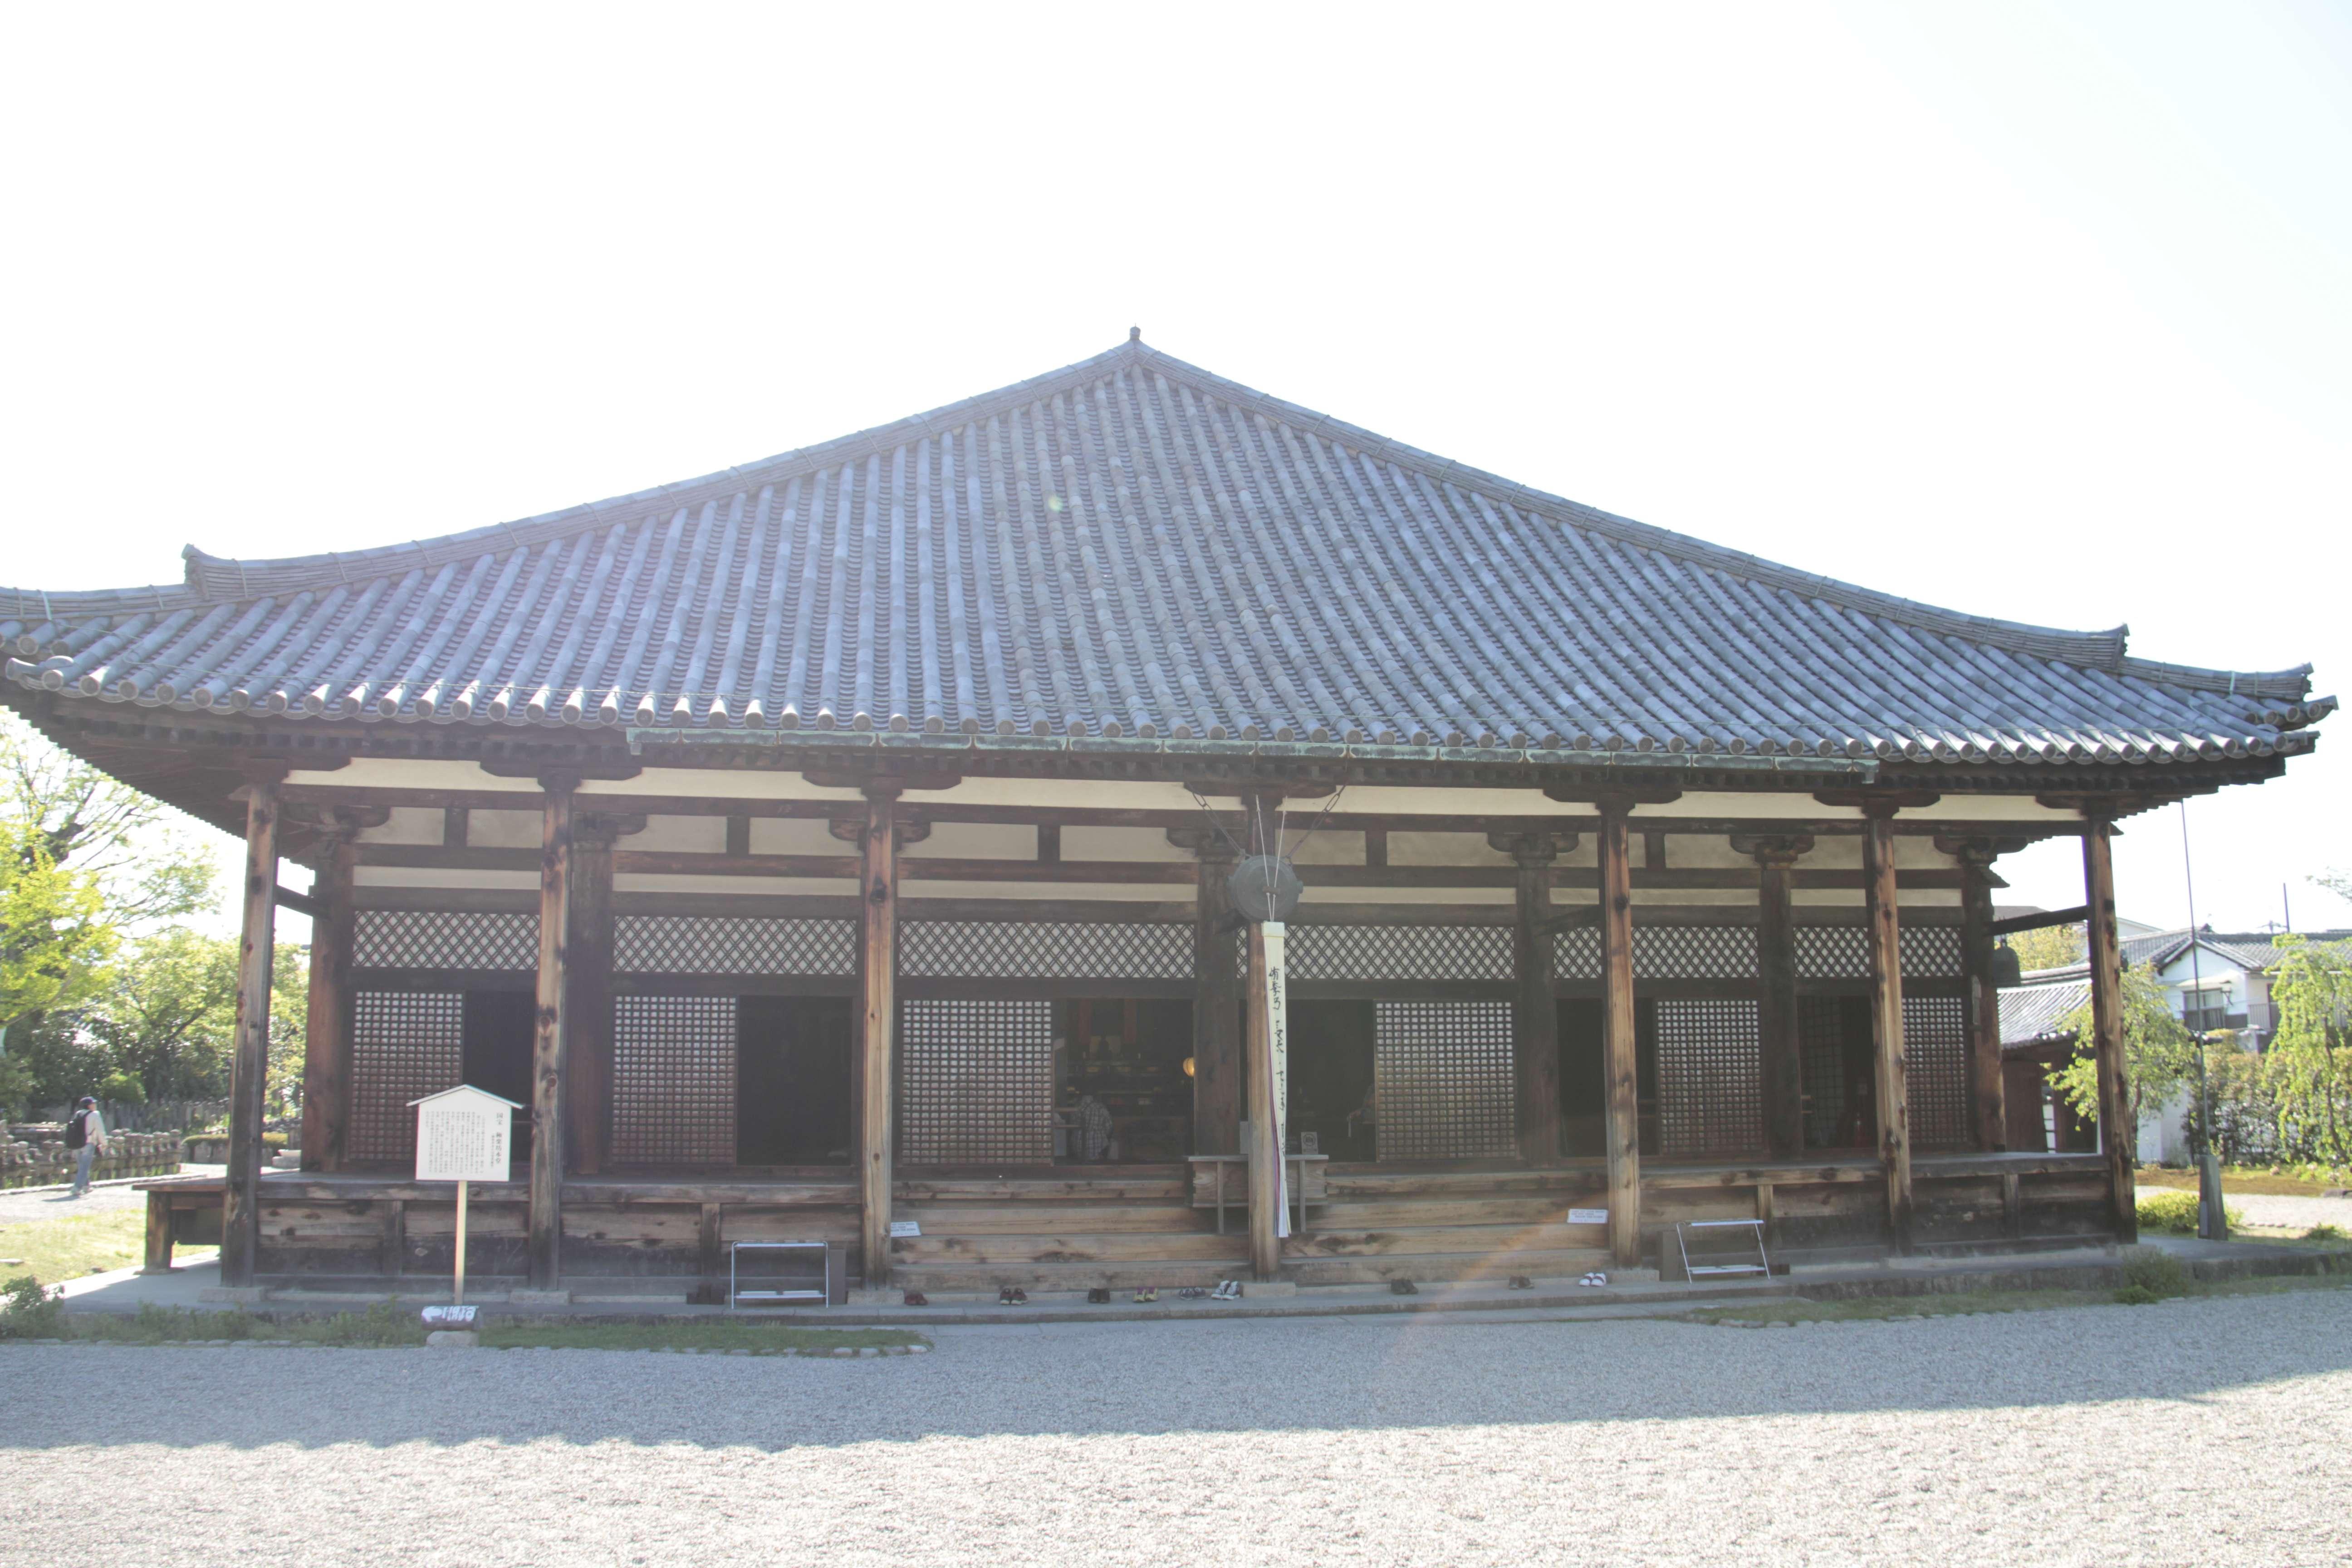 Japon avril 2017_0453 Nara temple bouddhiste Gango ji